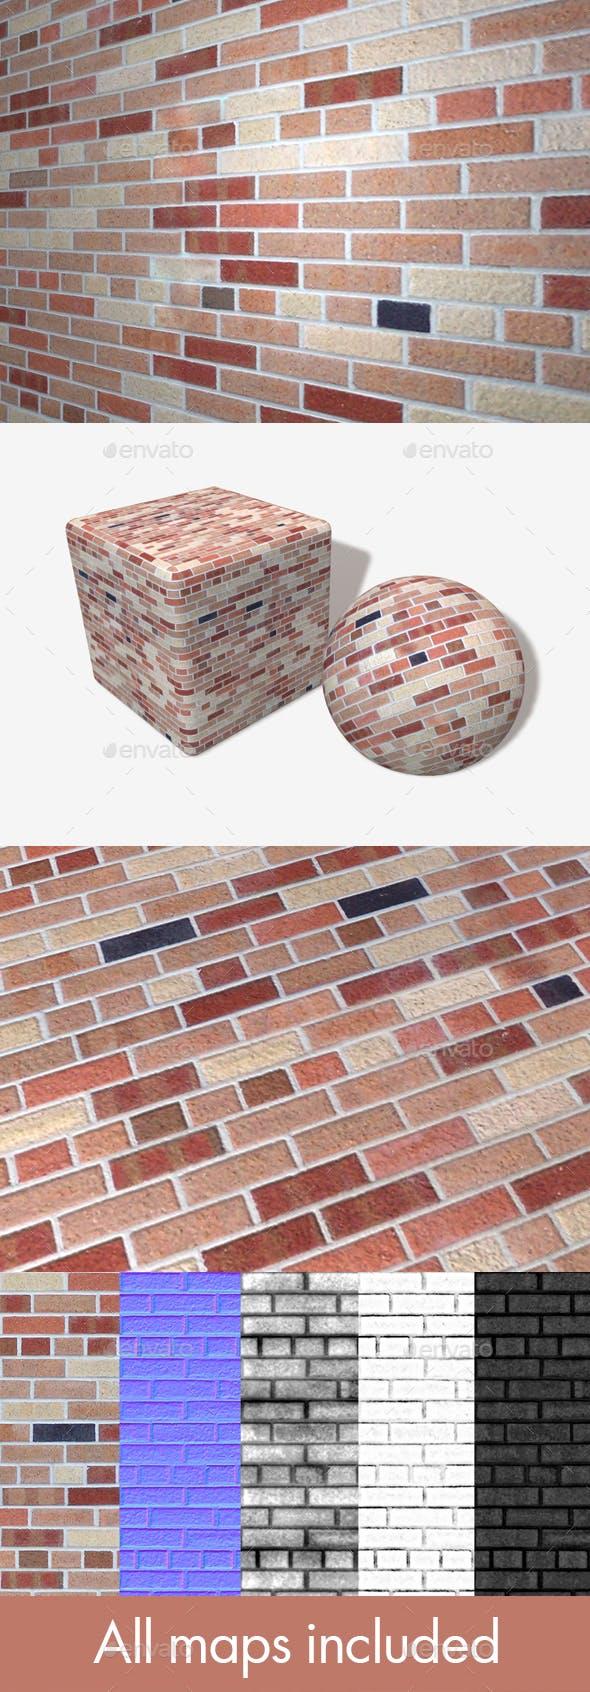 Modern Brick Wall Seamless Texture - 3DOcean Item for Sale